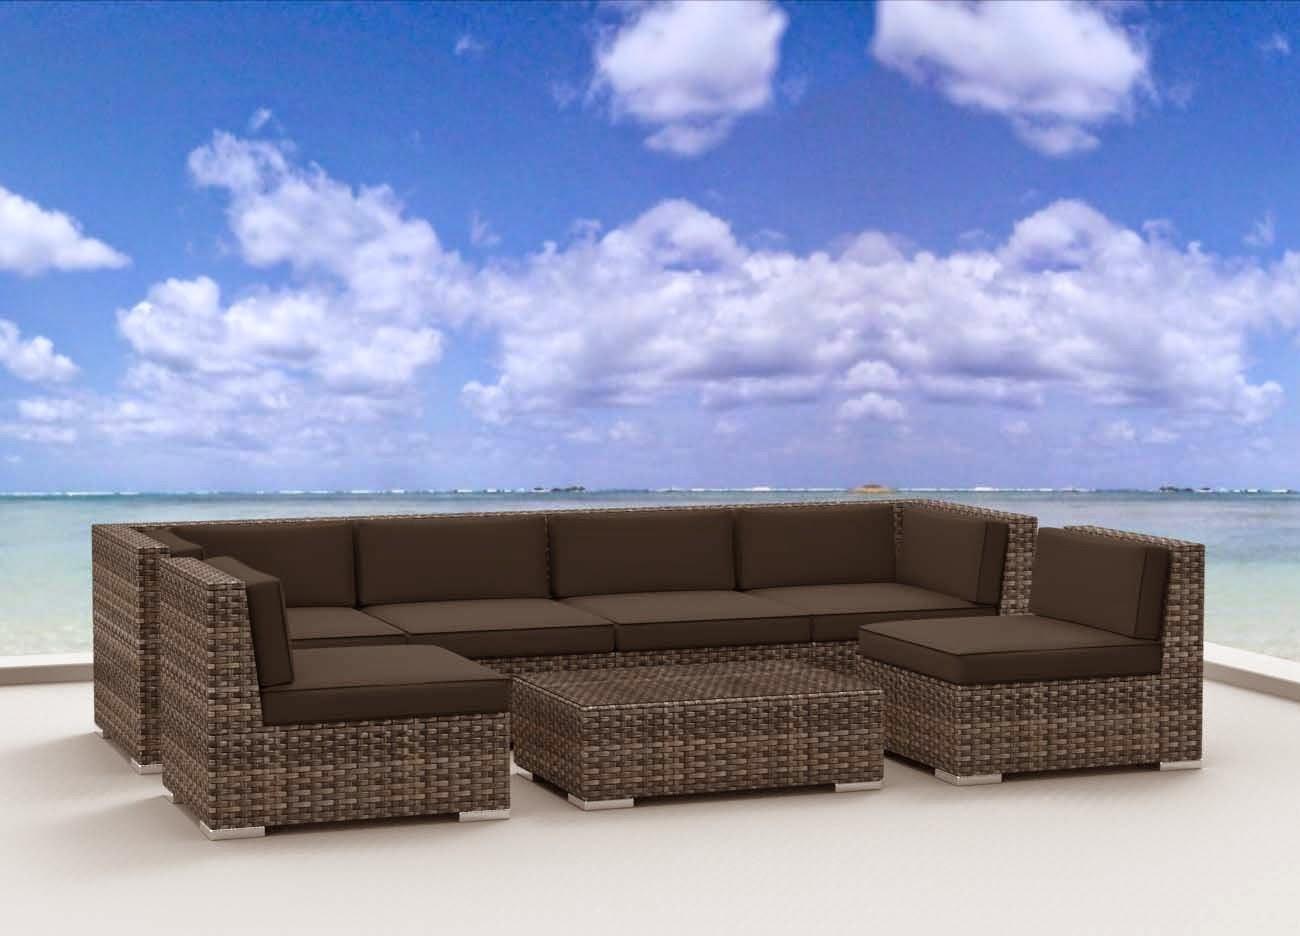 Outdoor Furniture Sofa Sectional Pink Leather Uk Urban Furnishing Modern Backyard Wicker Rattan